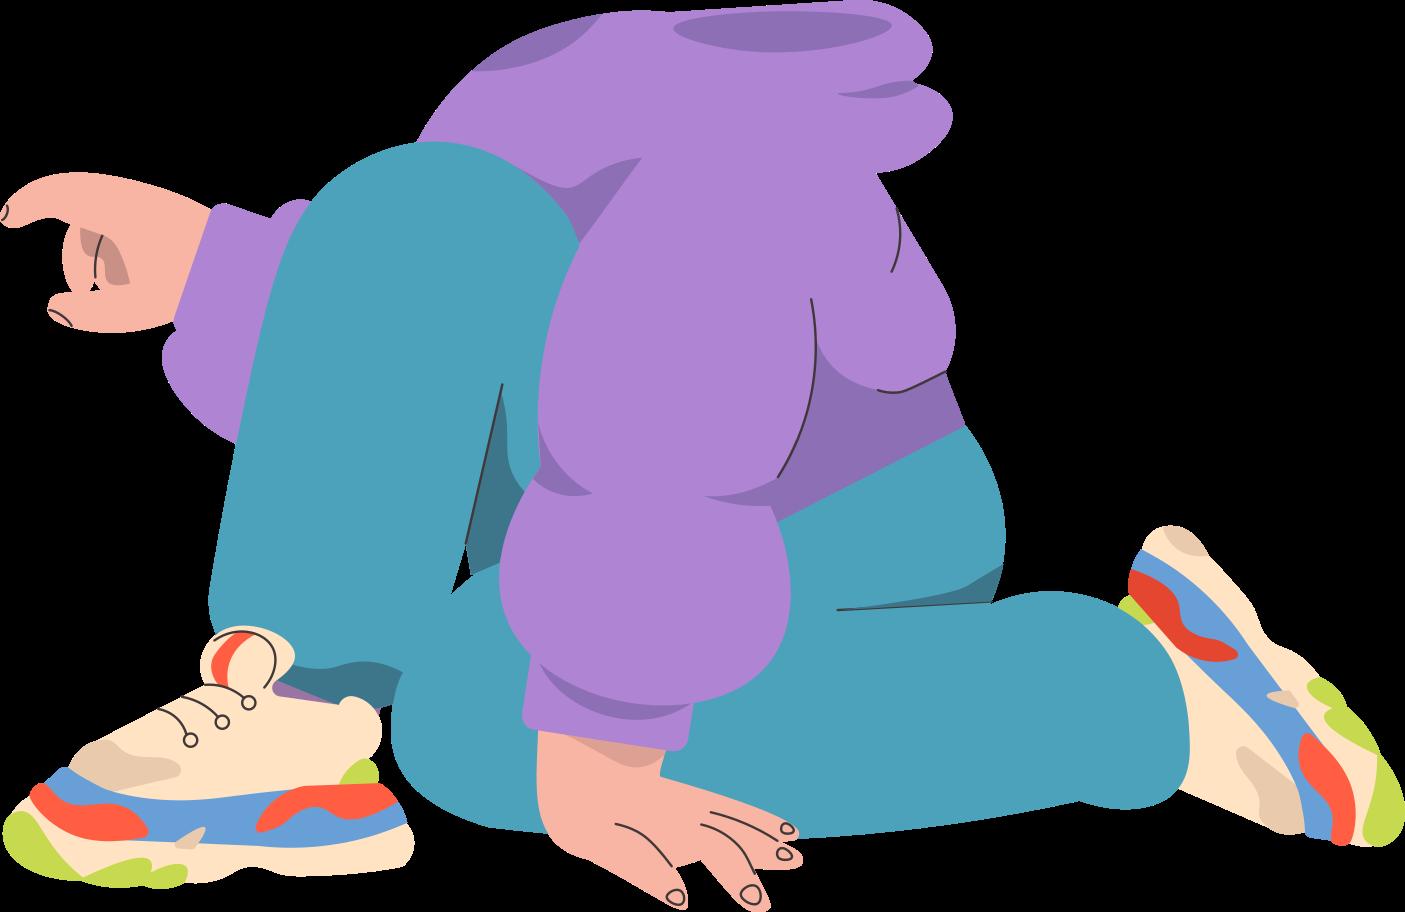 boy body Clipart illustration in PNG, SVG